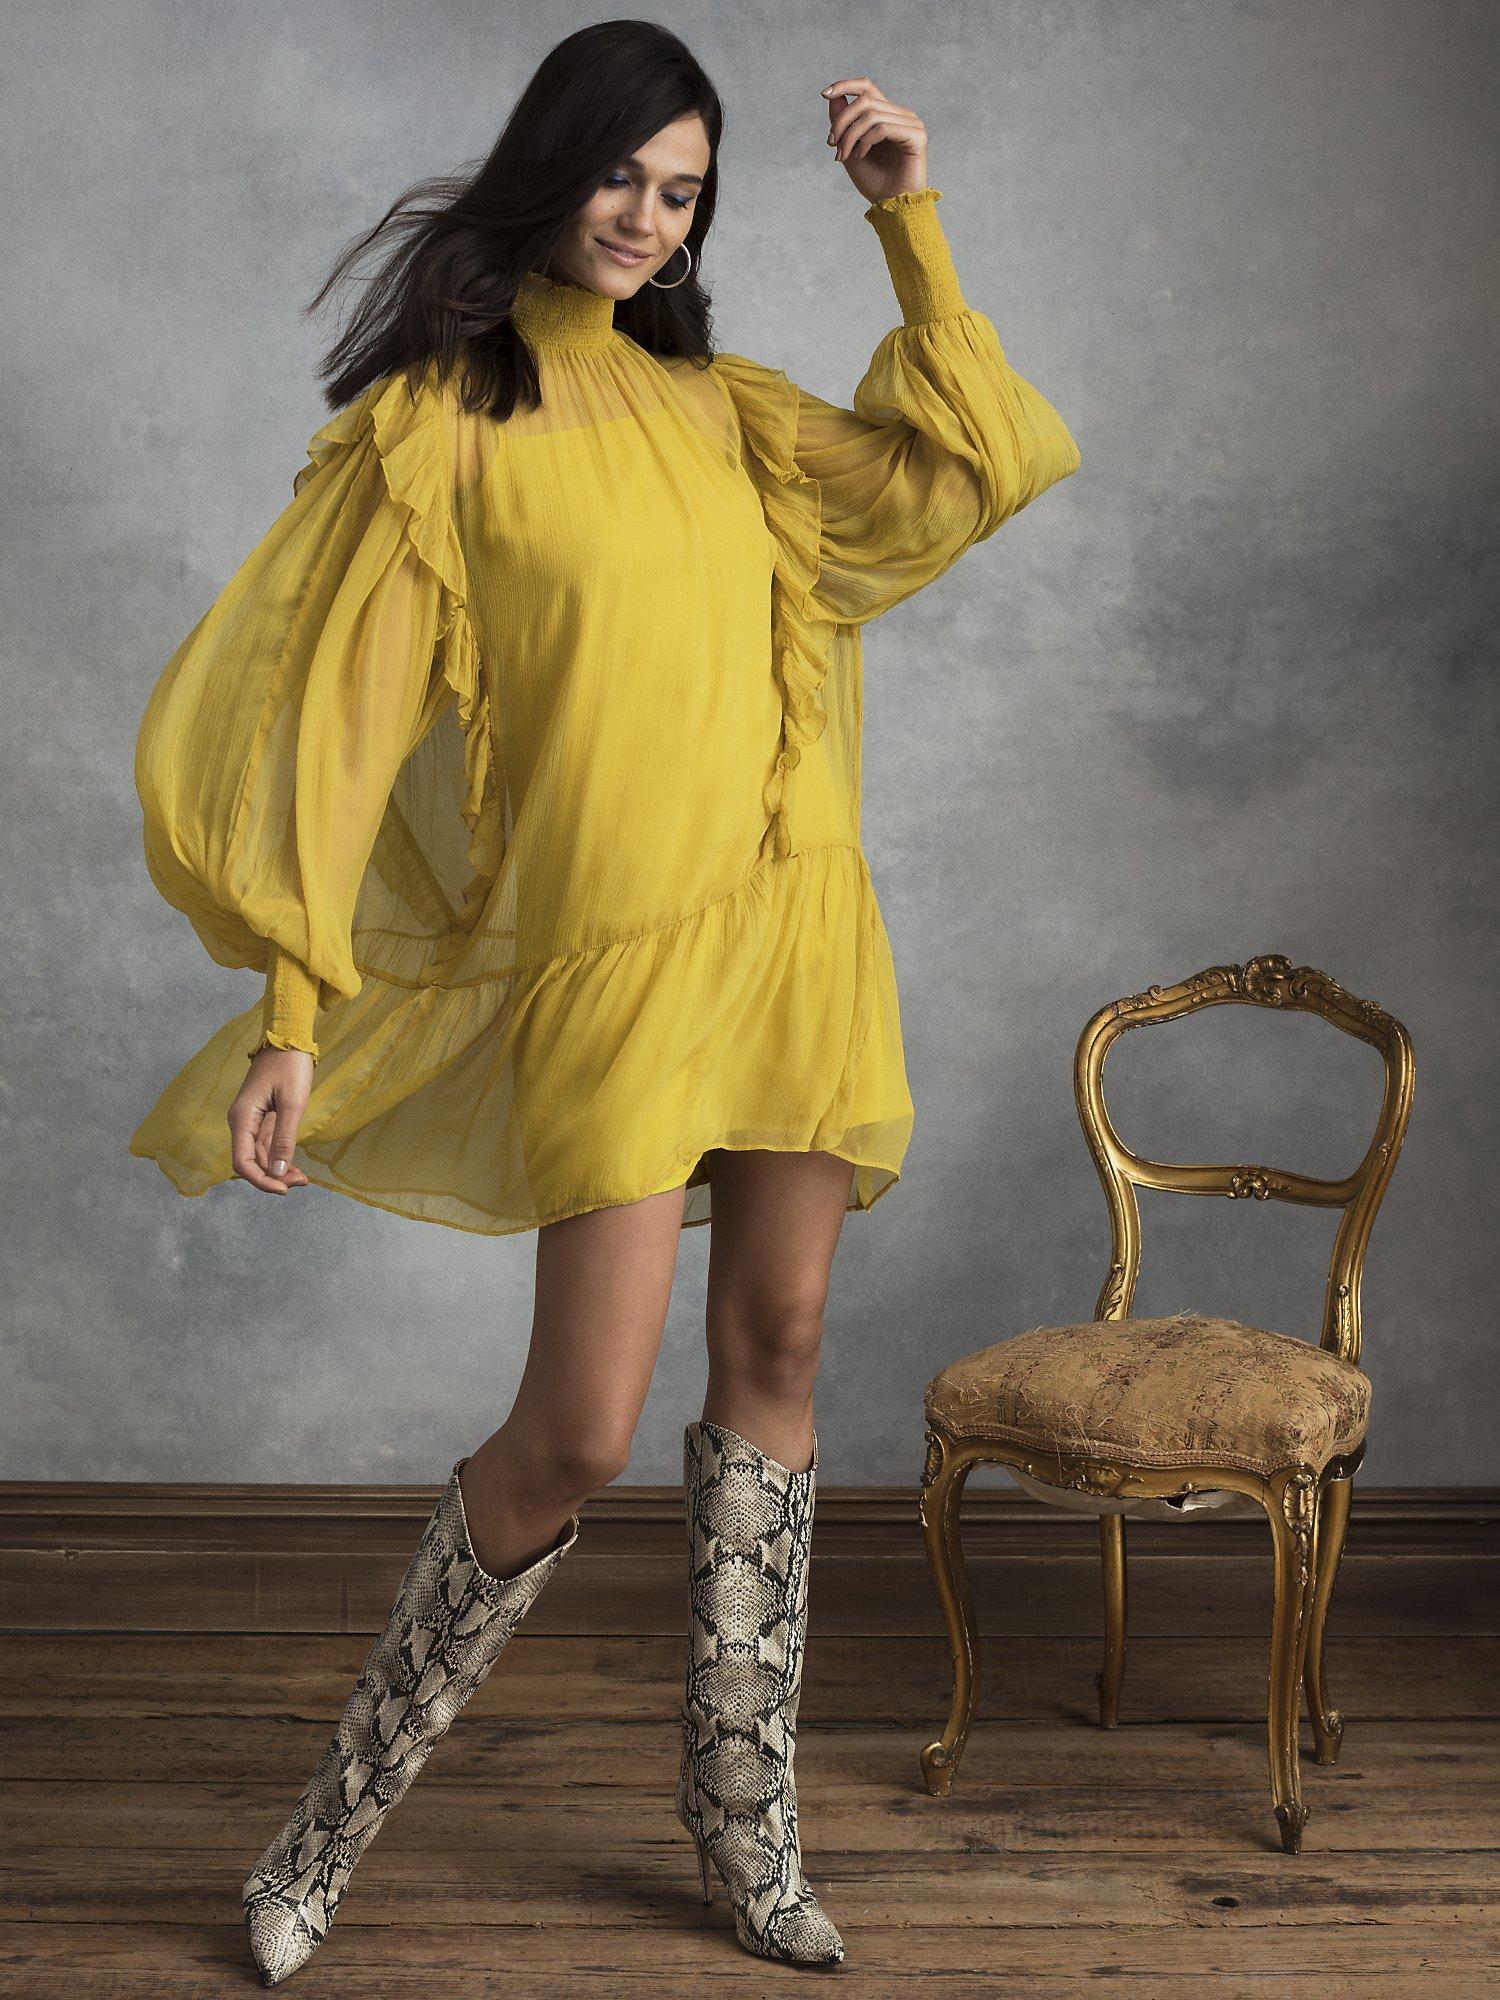 70s Dresses – Disco Dress, Hippie Dress, Wrap Dress Womens Jolie Ruffled Dress in Antique Moss  Size X-Large  Polyester by HappyxNature $74.00 AT vintagedancer.com